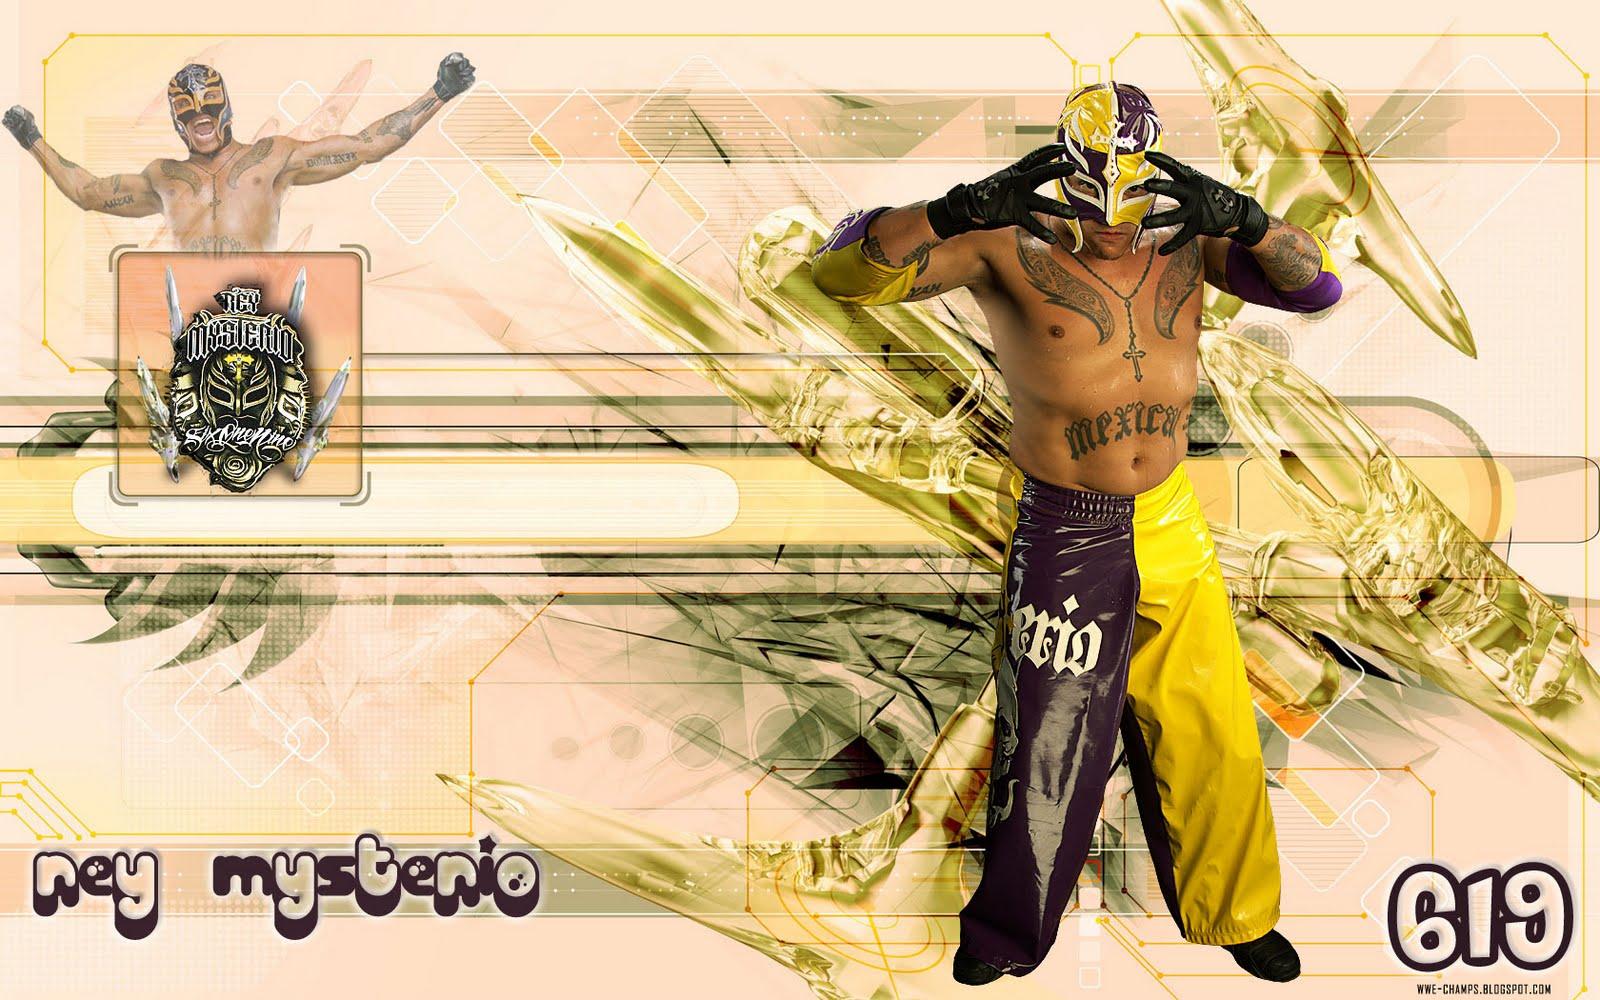 http://2.bp.blogspot.com/-Df9GBZ24YZ0/TeDPlPSlzJI/AAAAAAAAA4g/7OF3Qzd6T24/s1600/WWE-Rey-Mysterio-Widescreen-Wallpaper%2Bcopy.jpg